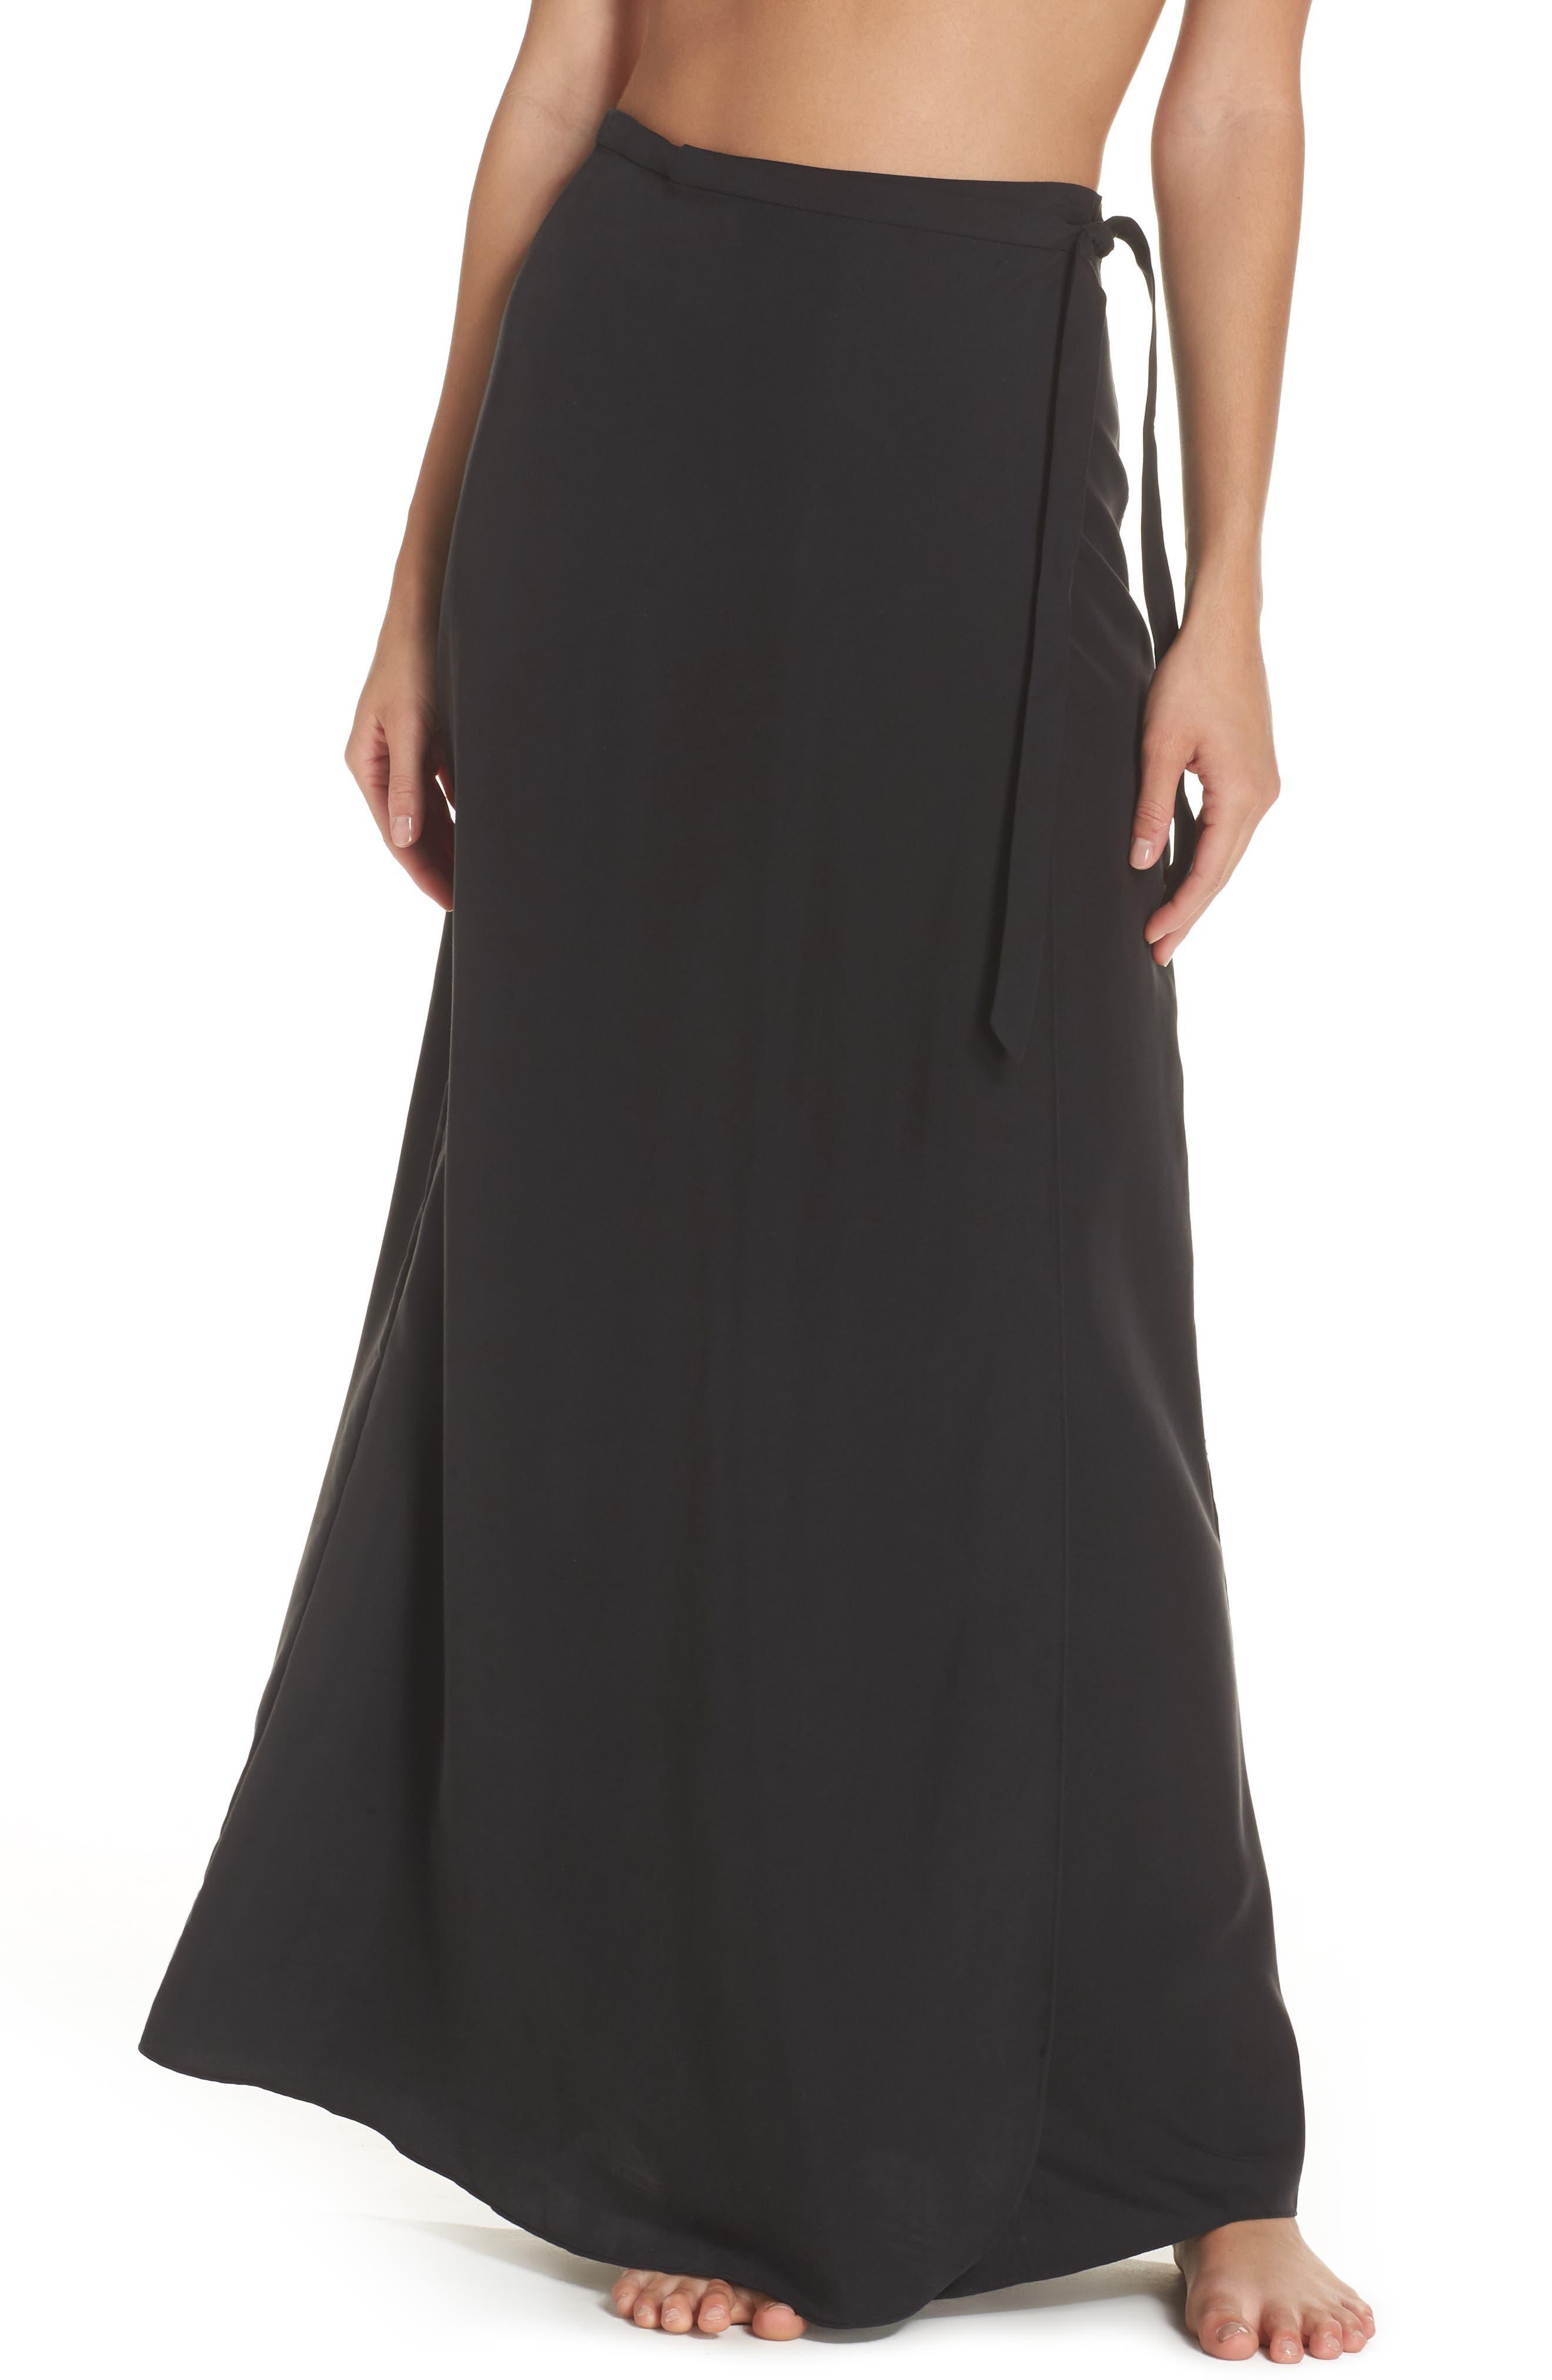 TAVIK Lasting Impressions Cover-Up Maxi Skirt